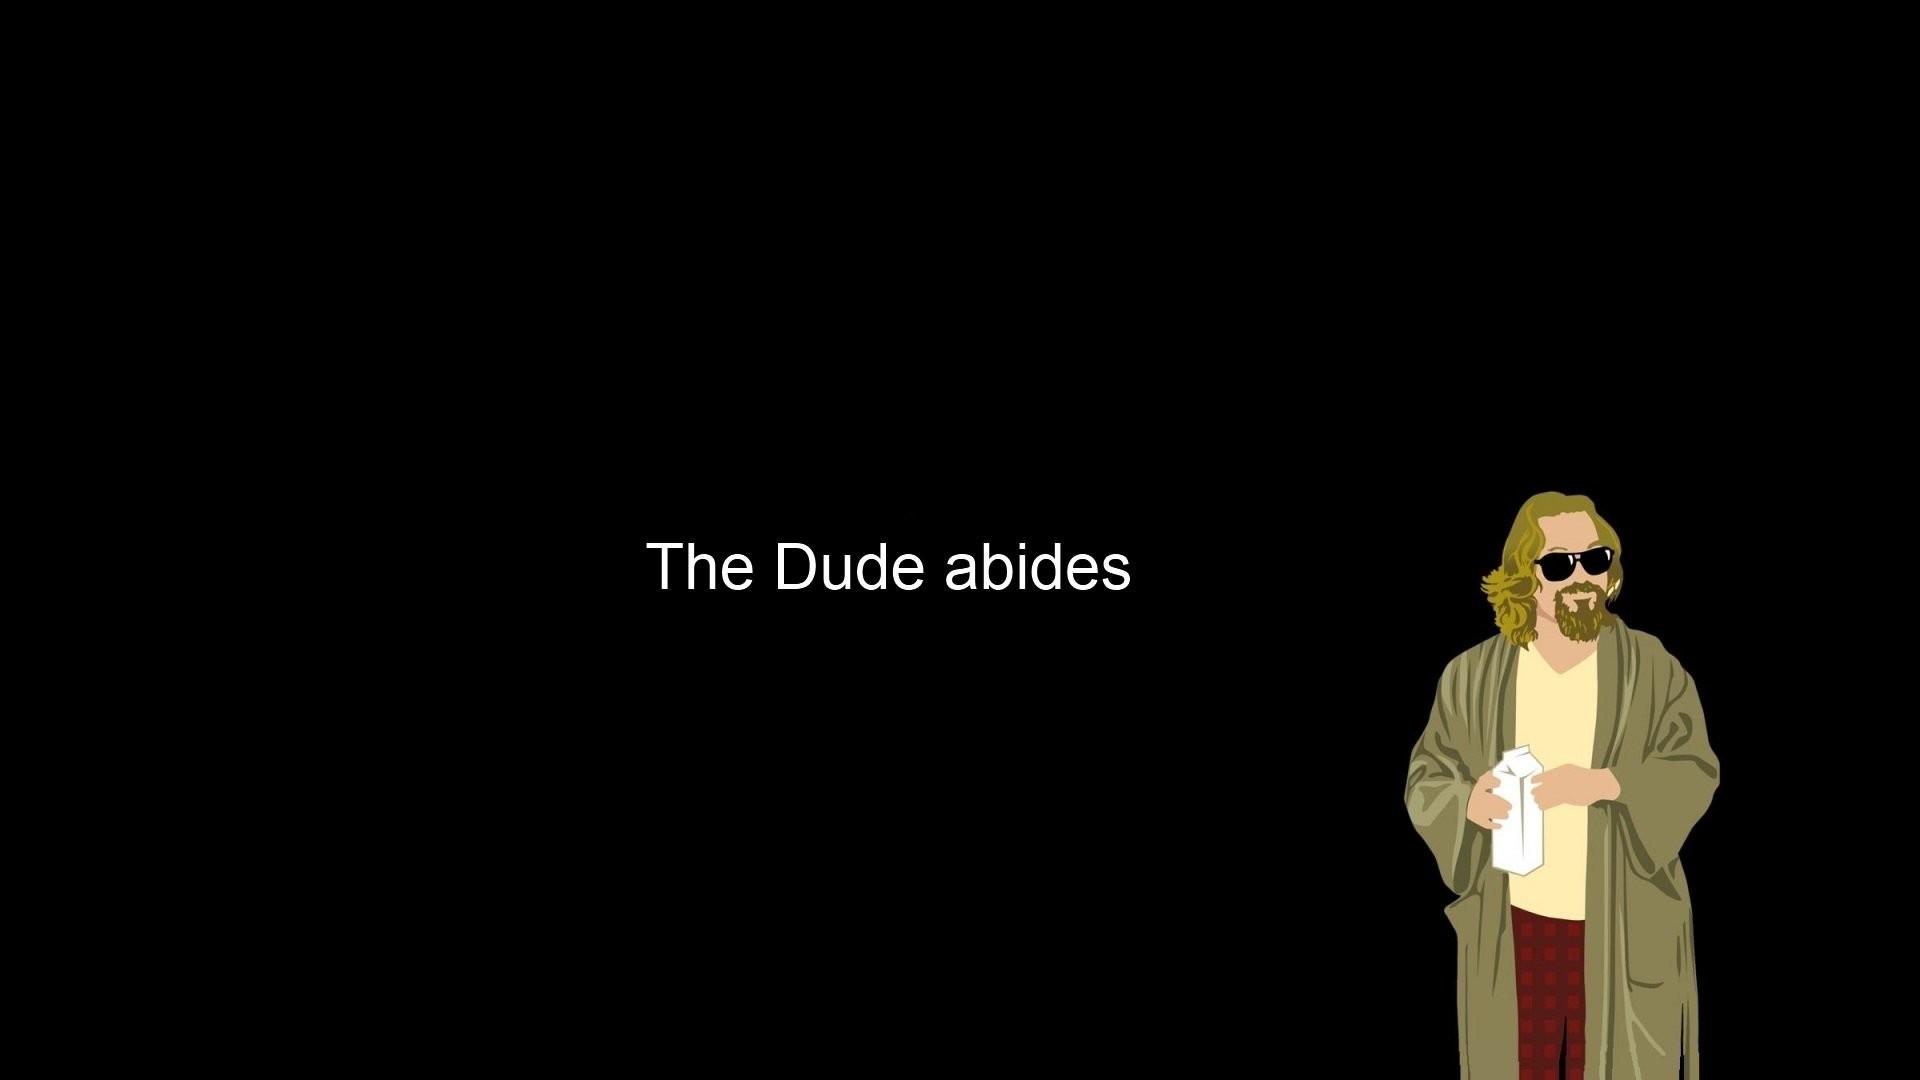 The Dude The Big Lebowski wallpaper     335490   WallpaperUP .